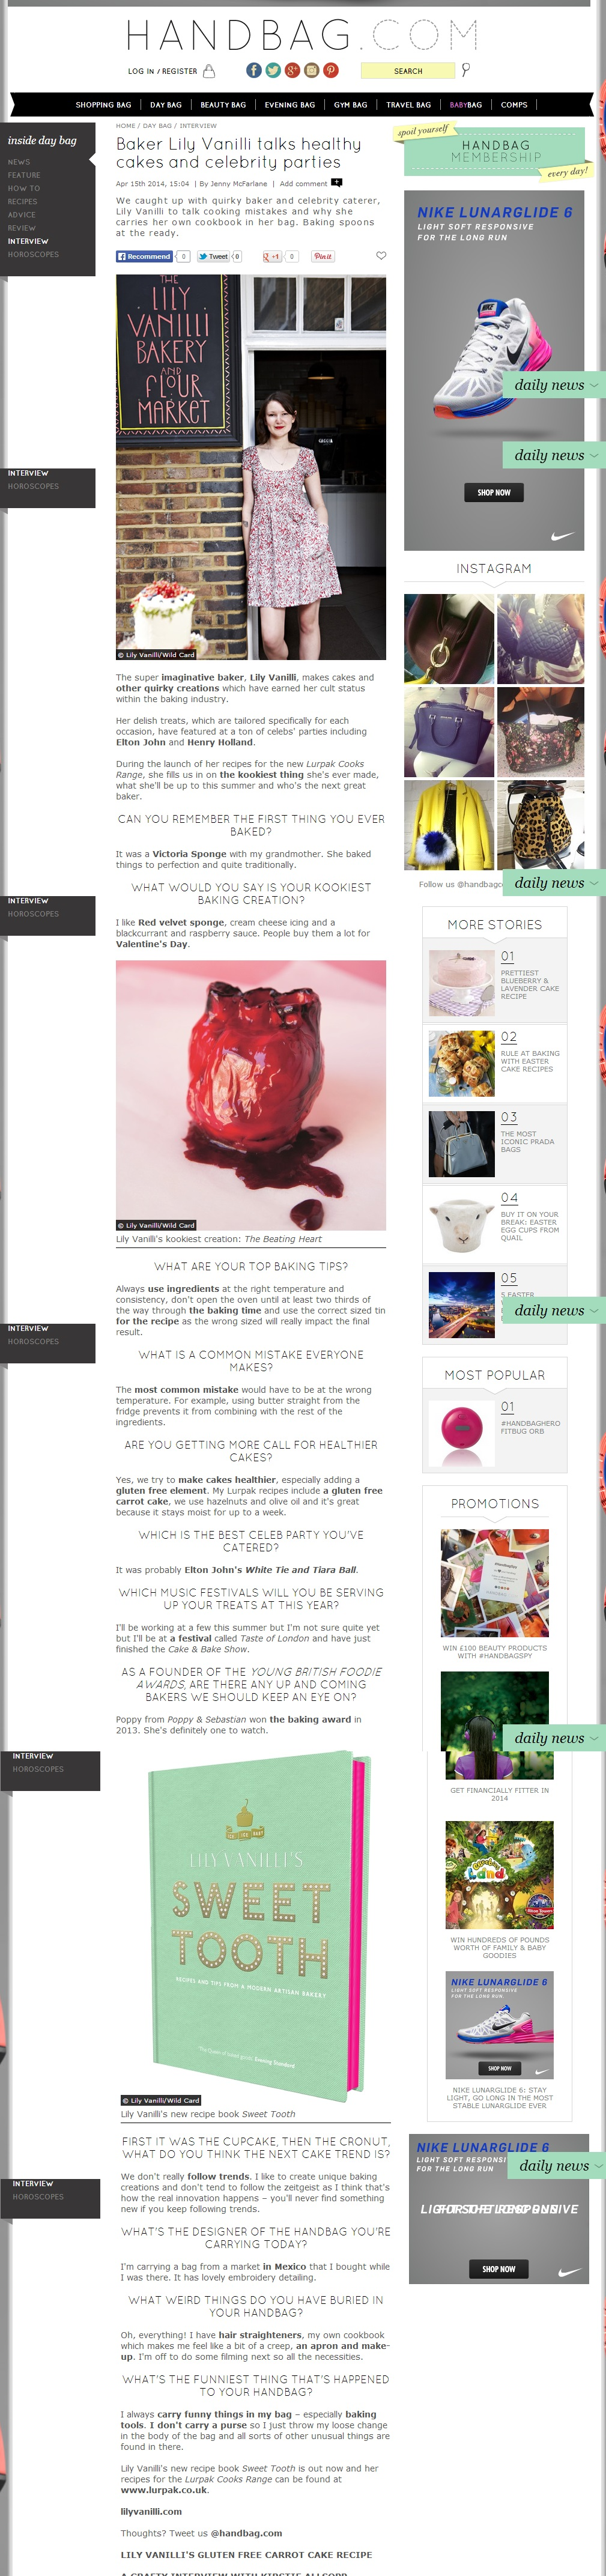 screencapture-www-handbag-com-day-bag-interviews-a563576-baker-lily-vanilli-talks-healthy-cakes-and-celebrity-parties-html